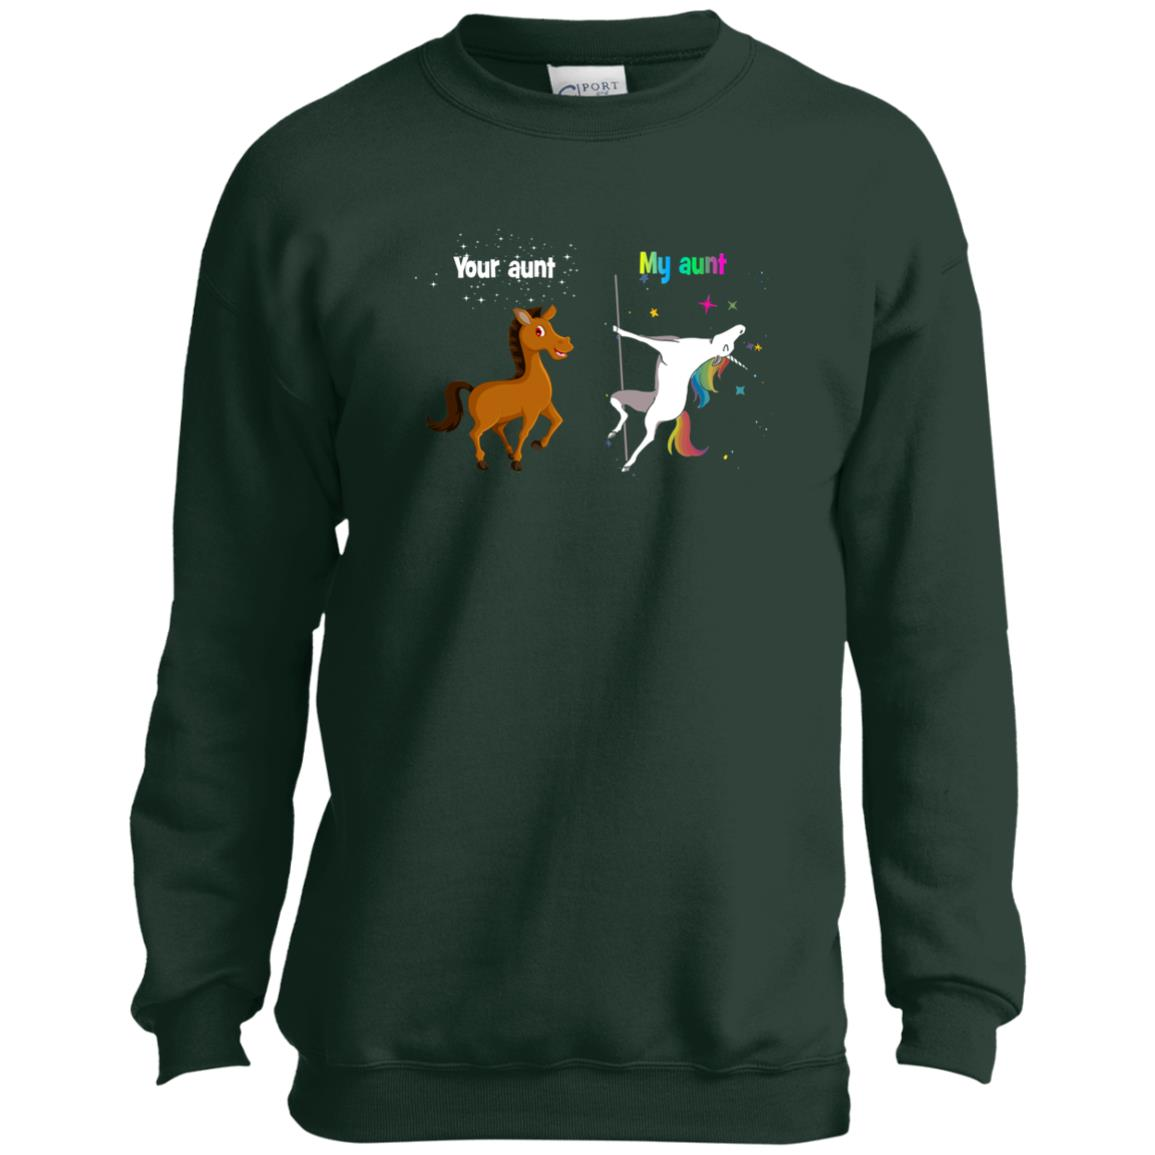 image 963px My aunt unicorn vs your aunt horse youth t shirt